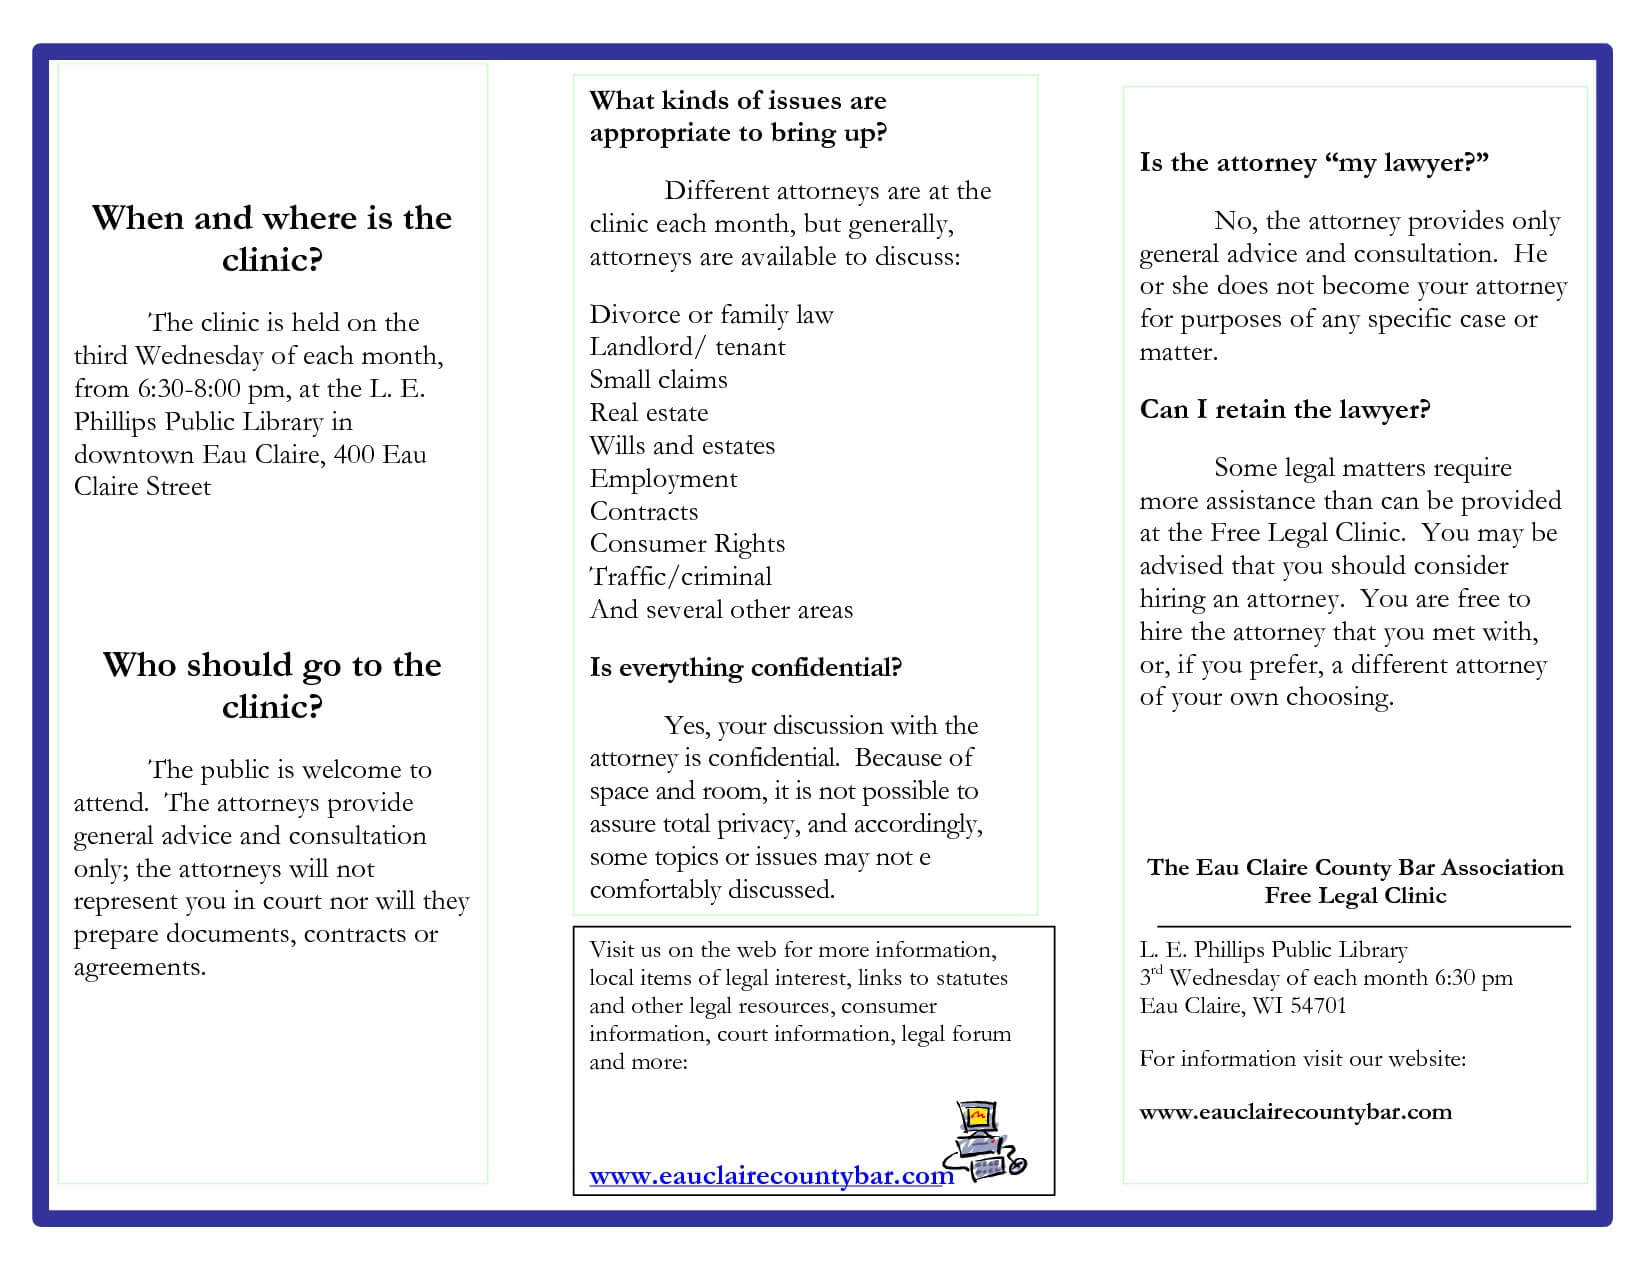 Printable Travel Brochure Template For Kids Templates Throughout Travel Brochure Template For Students